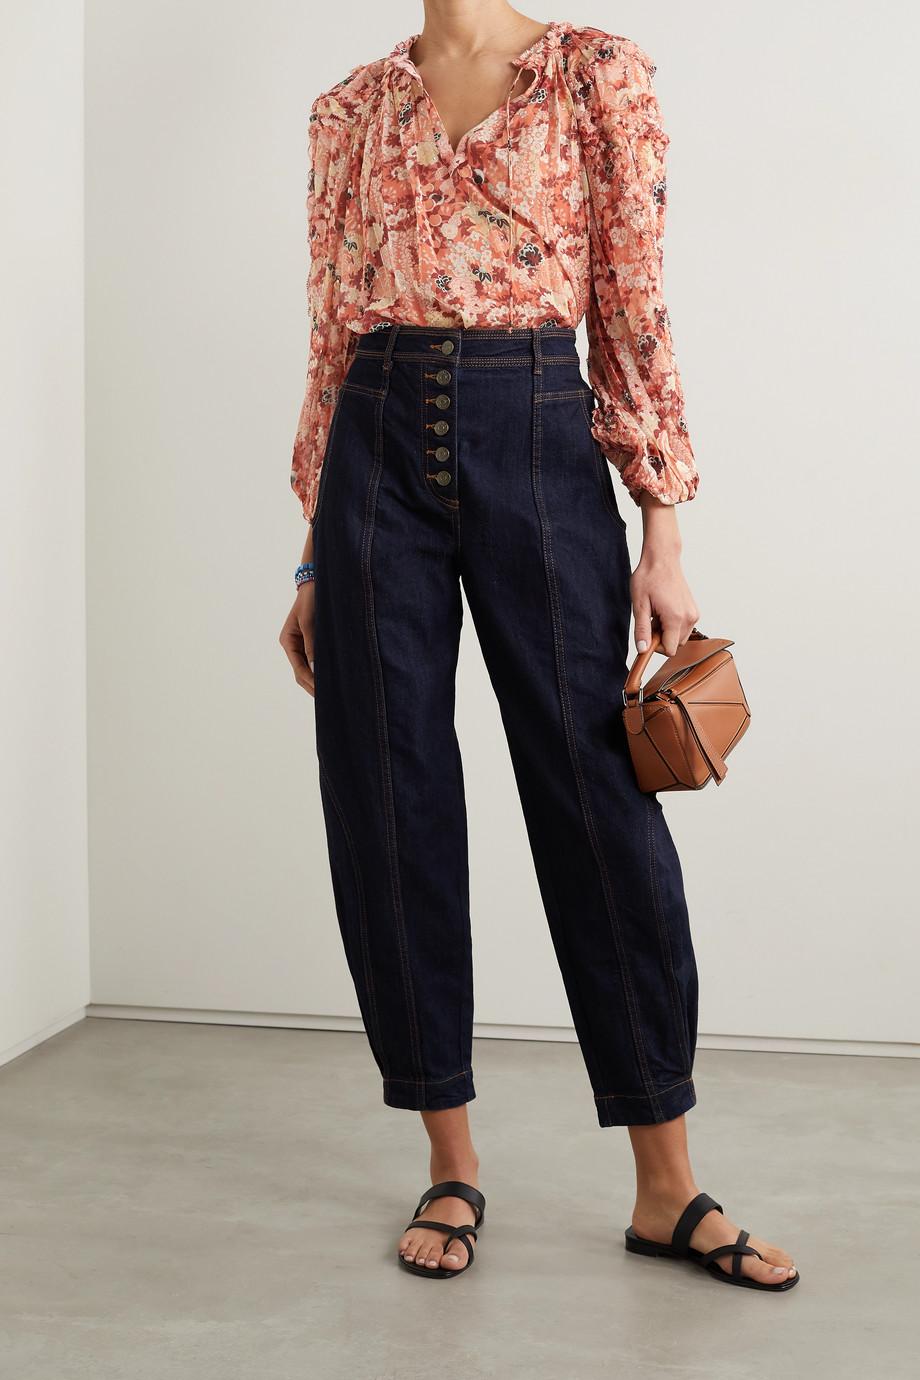 Ulla Johnson Adela floral-print fil coupé silk and Lurex-blend blouse